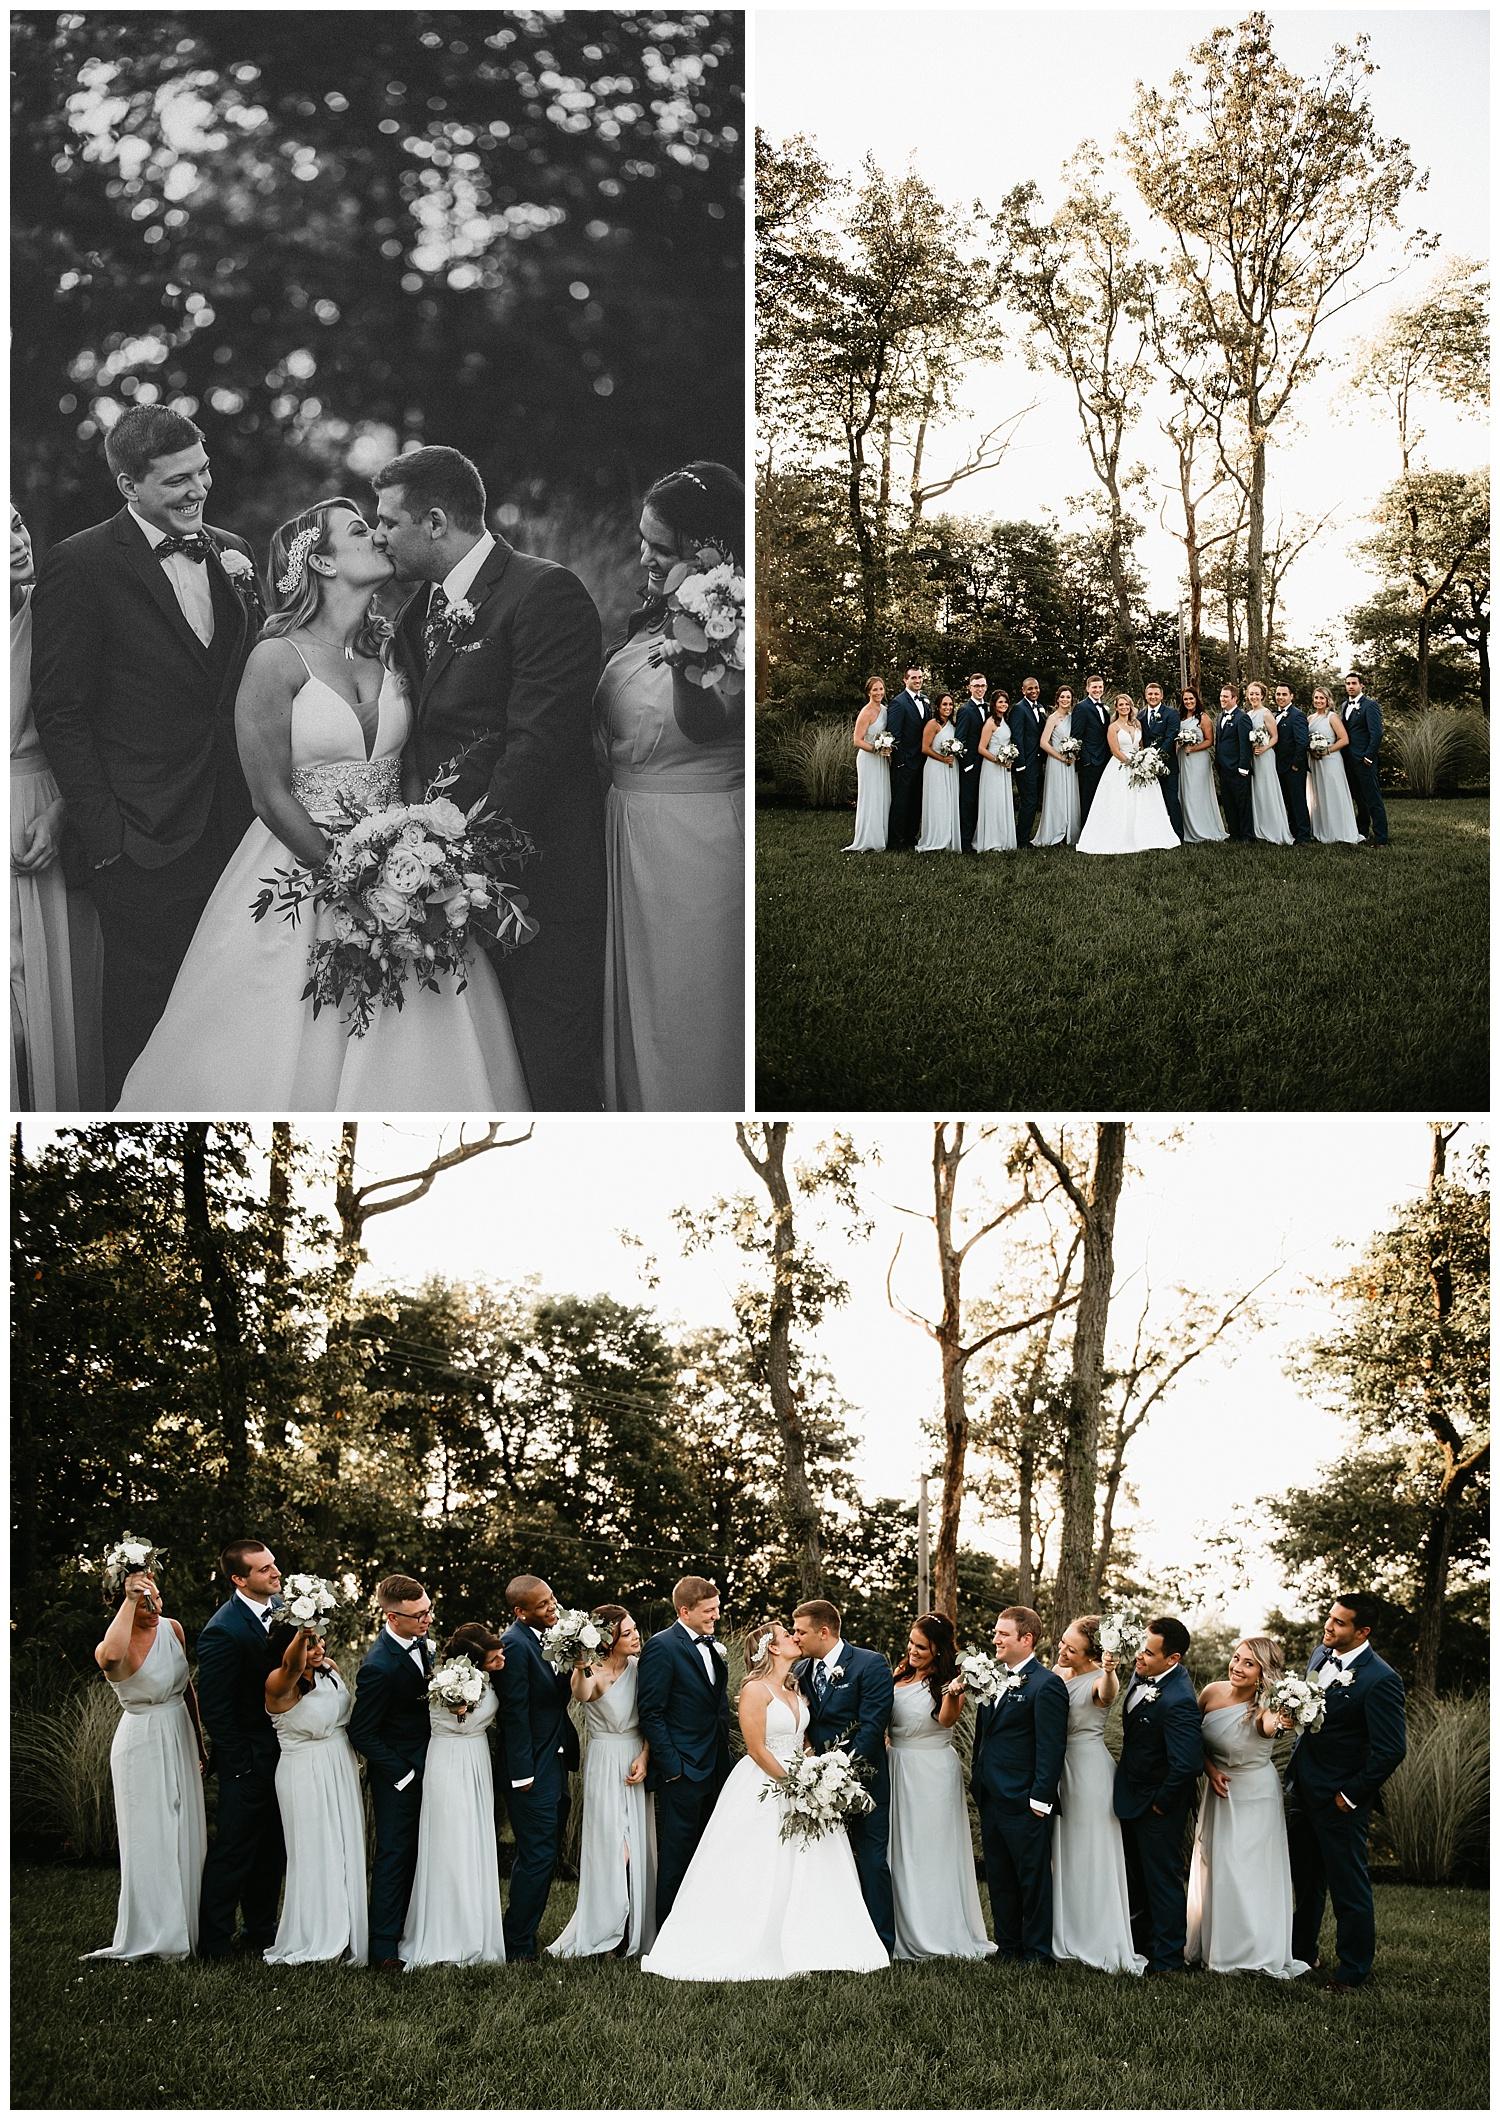 Destination-Wedding-Photographer-in-NEPA-Palmerton-PA_0014.jpg